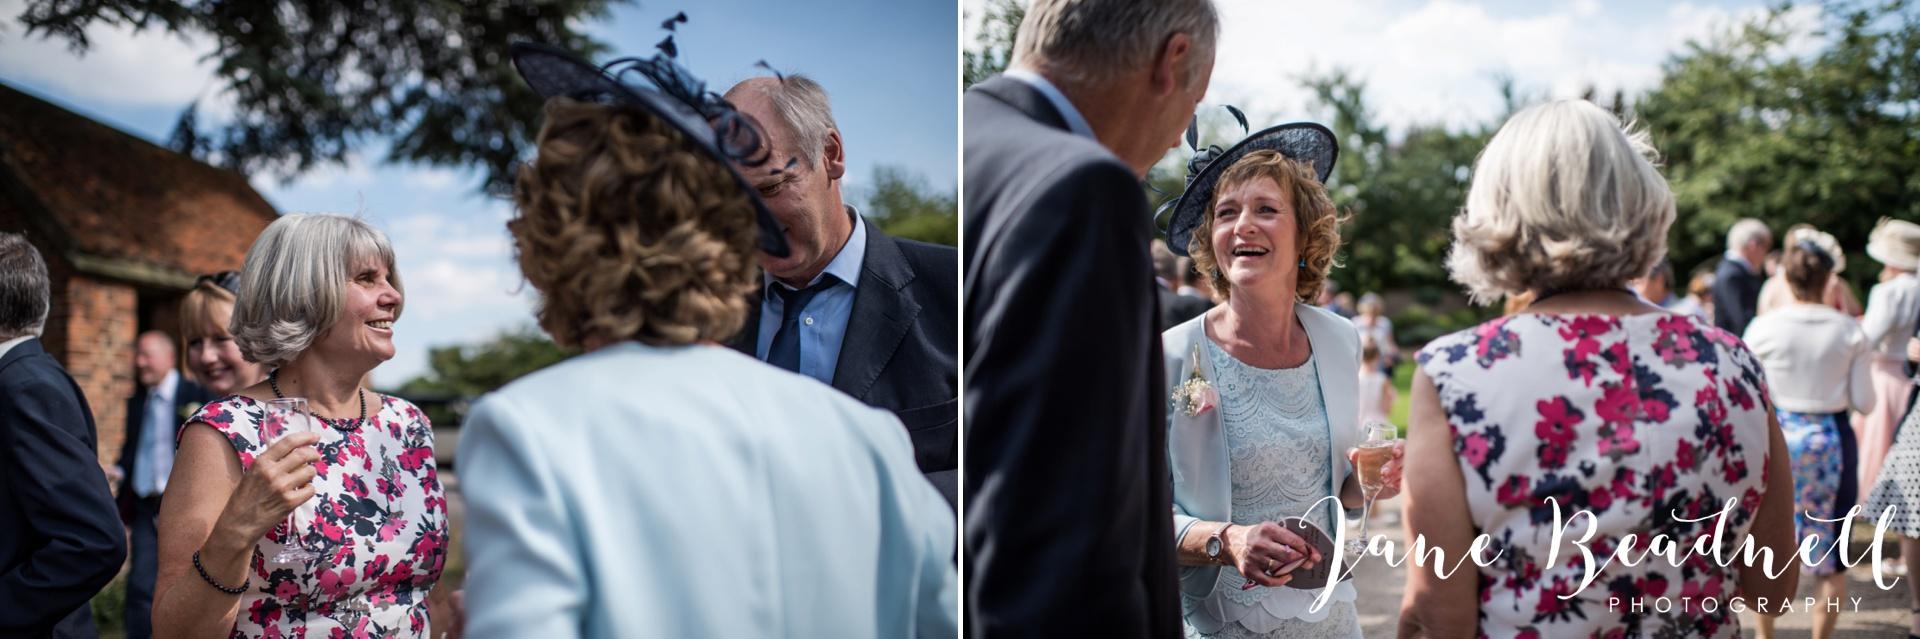 yorkshire-fine-art-wedding-photographer-jane-beadnell-photography-poppleton-york_0074